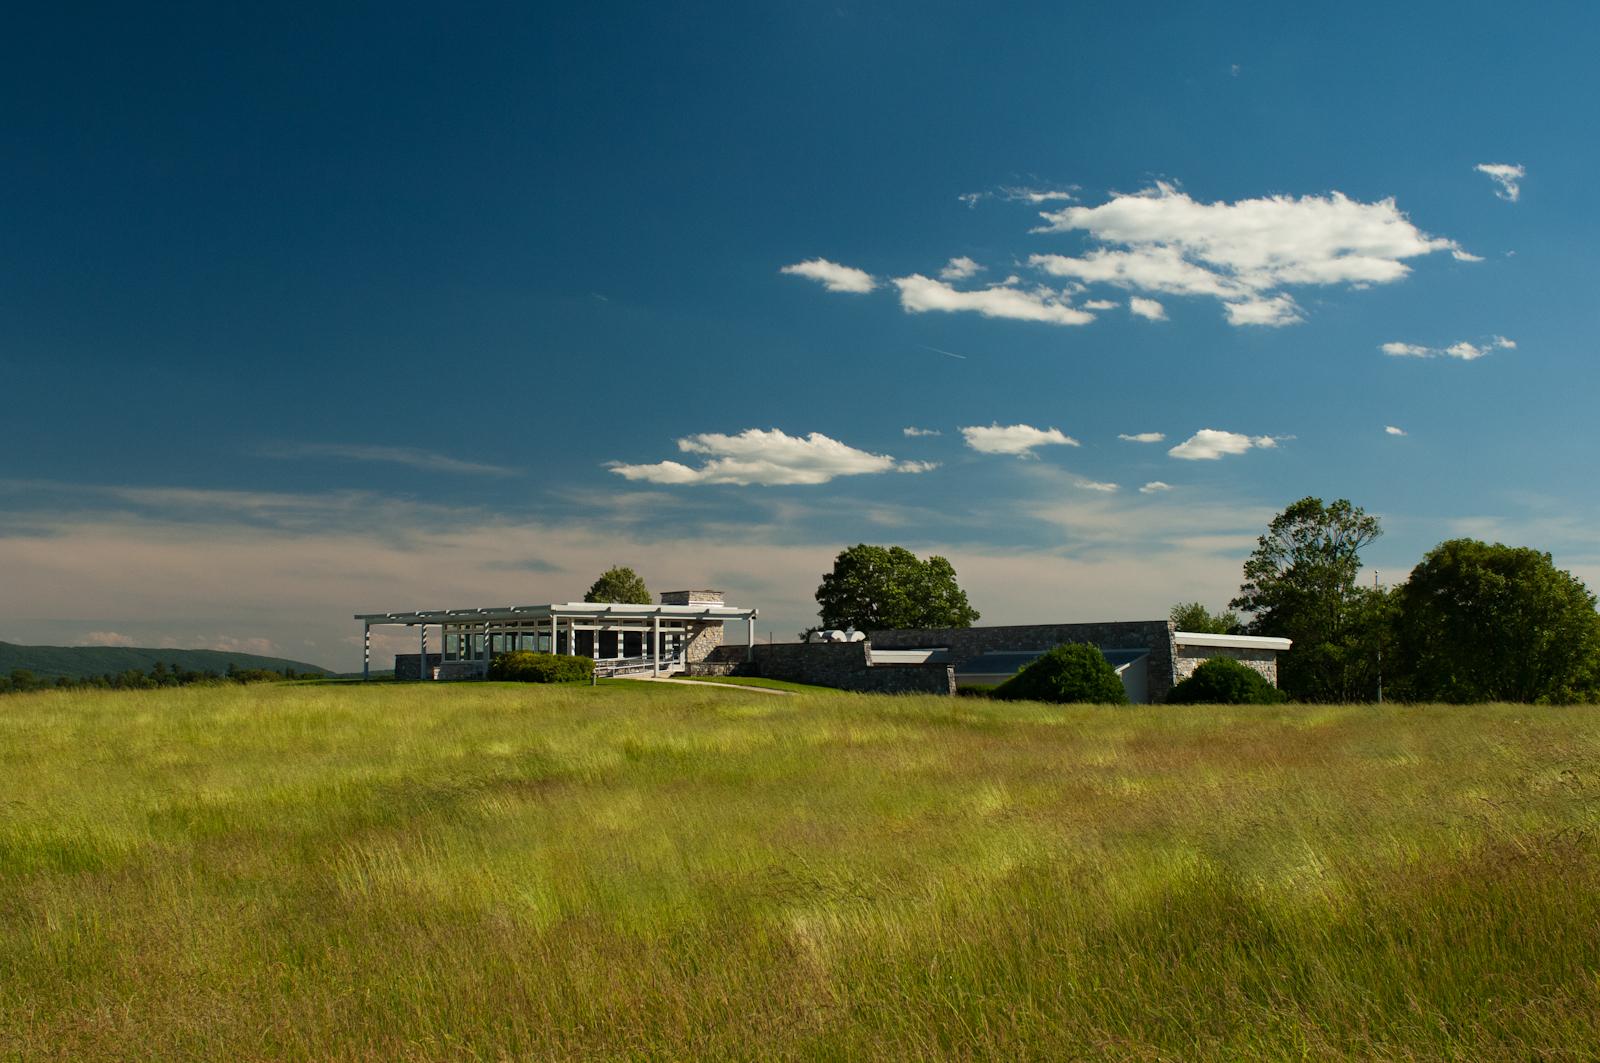 Visitor's Center, Antietam National Battlefield Park, Sharpsburg